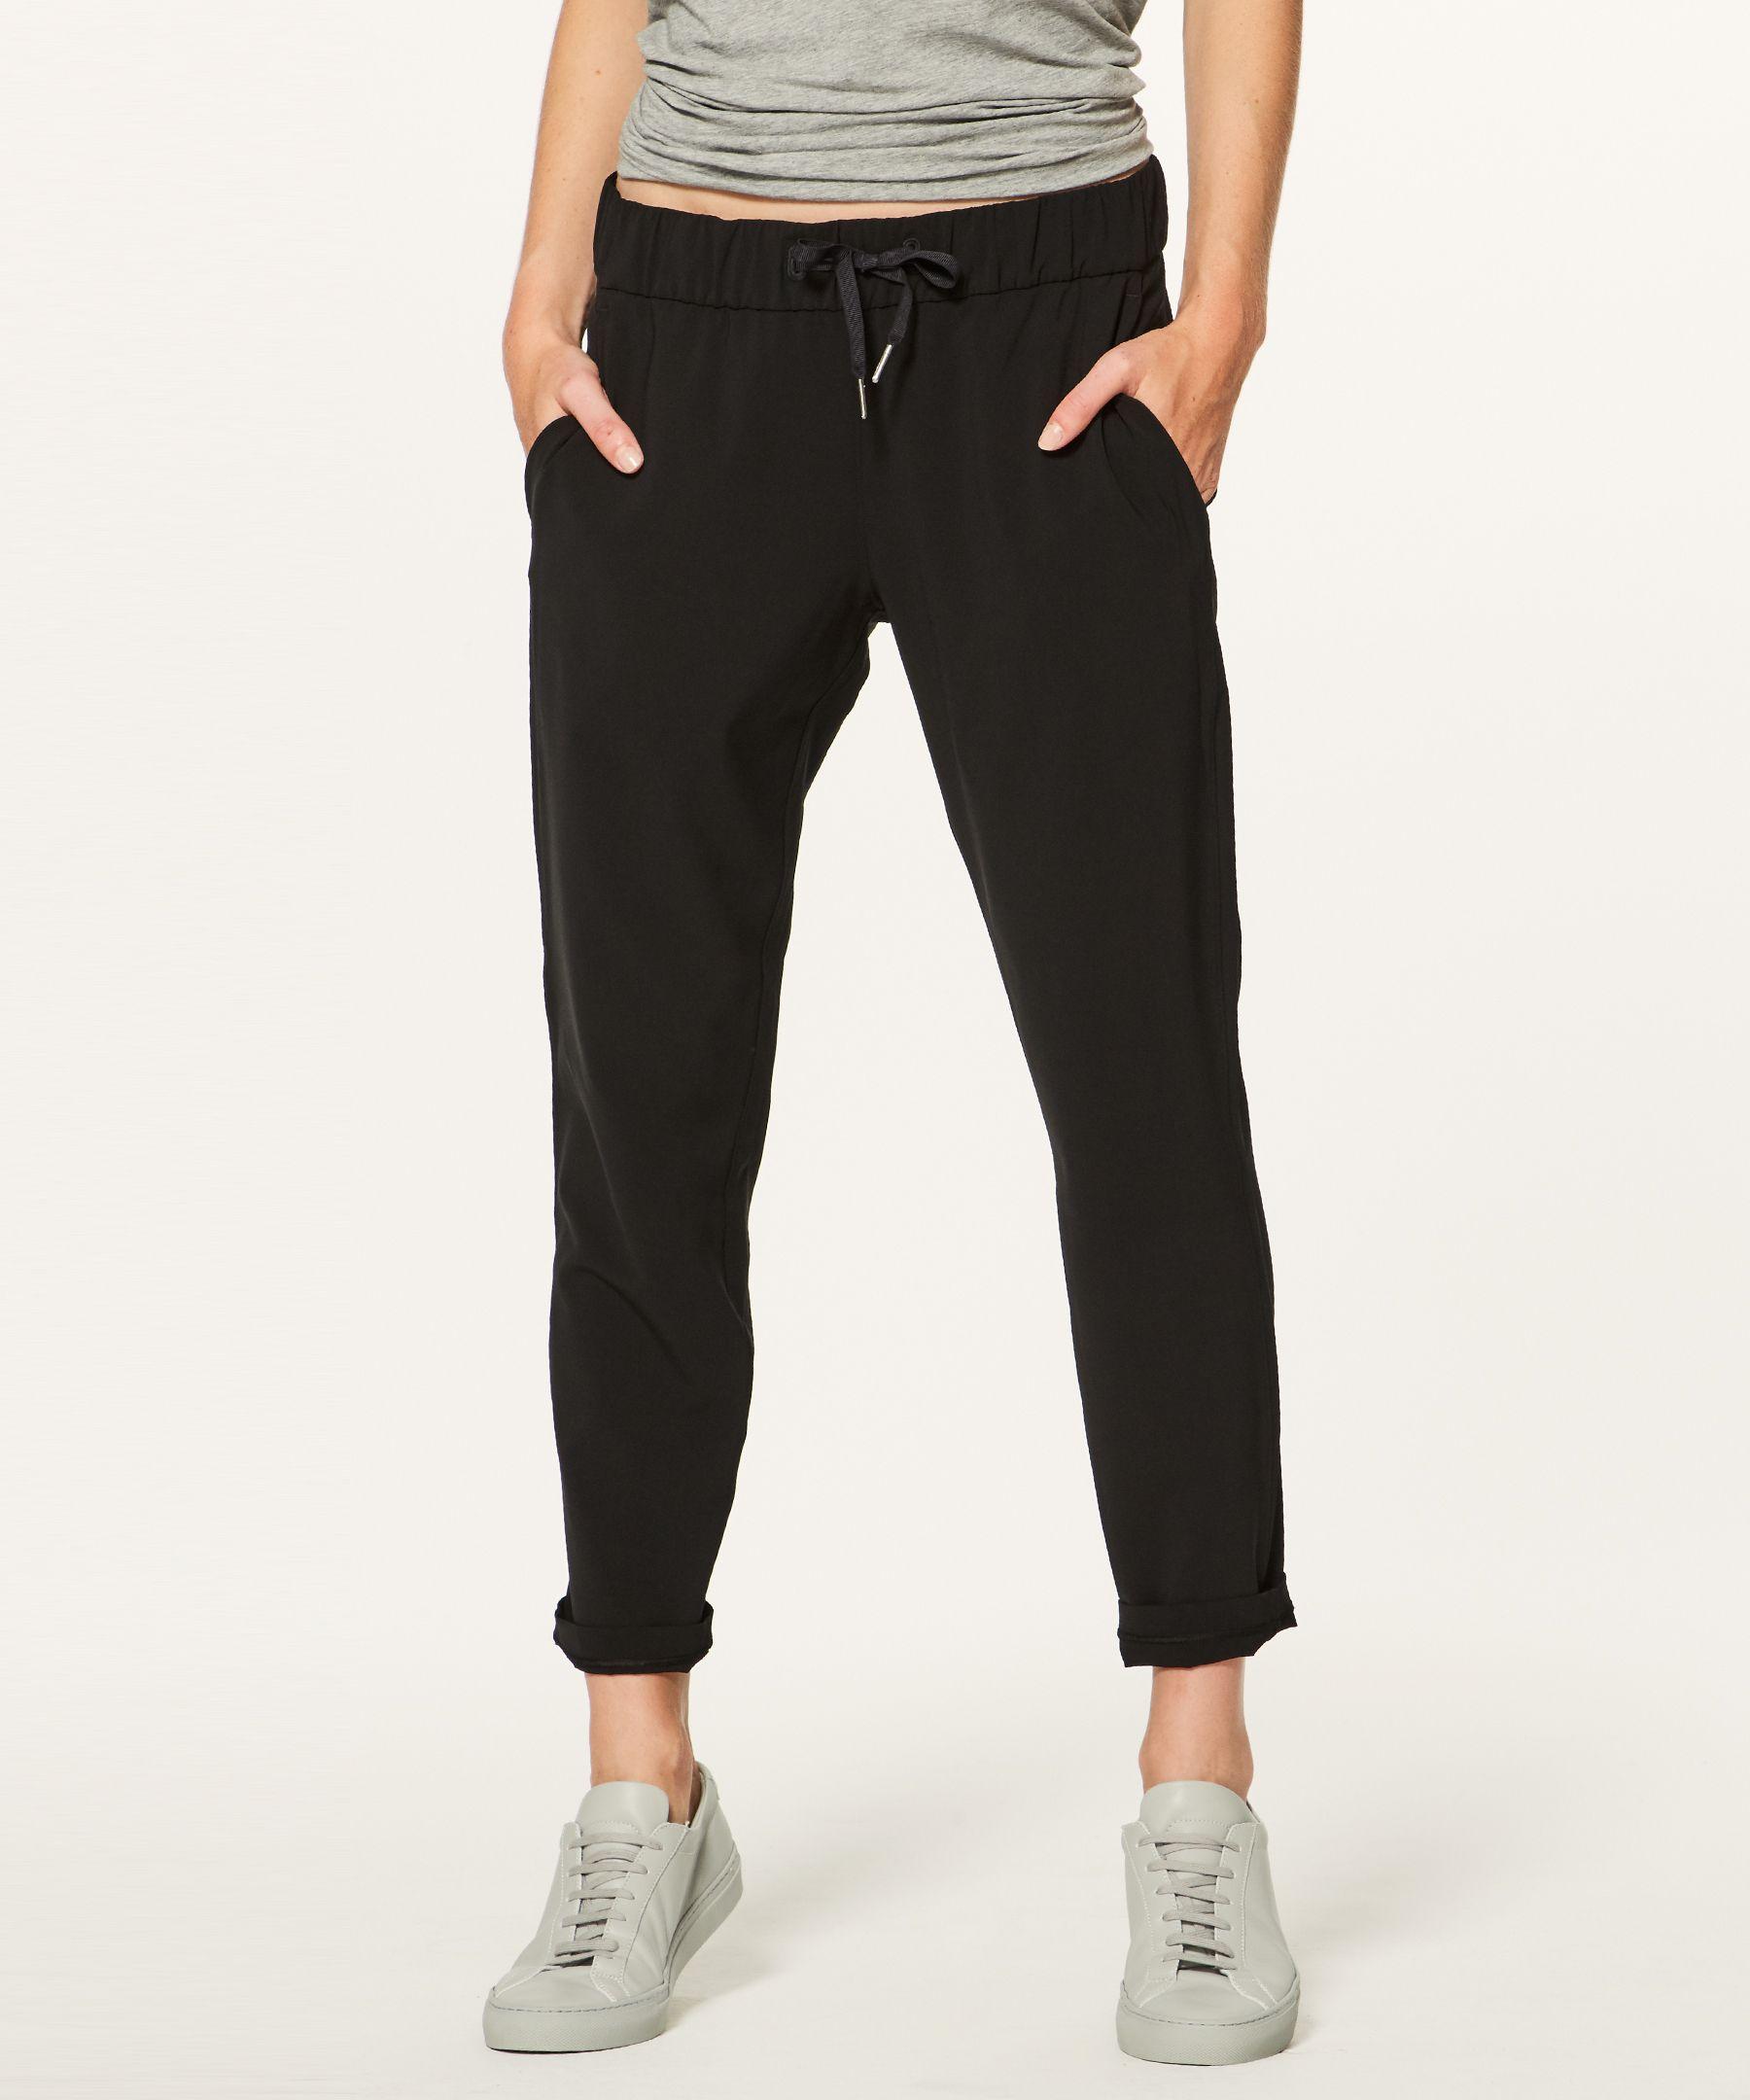 "On The Fly Pant *Woven 28"" | Women's Pants | lululemon"